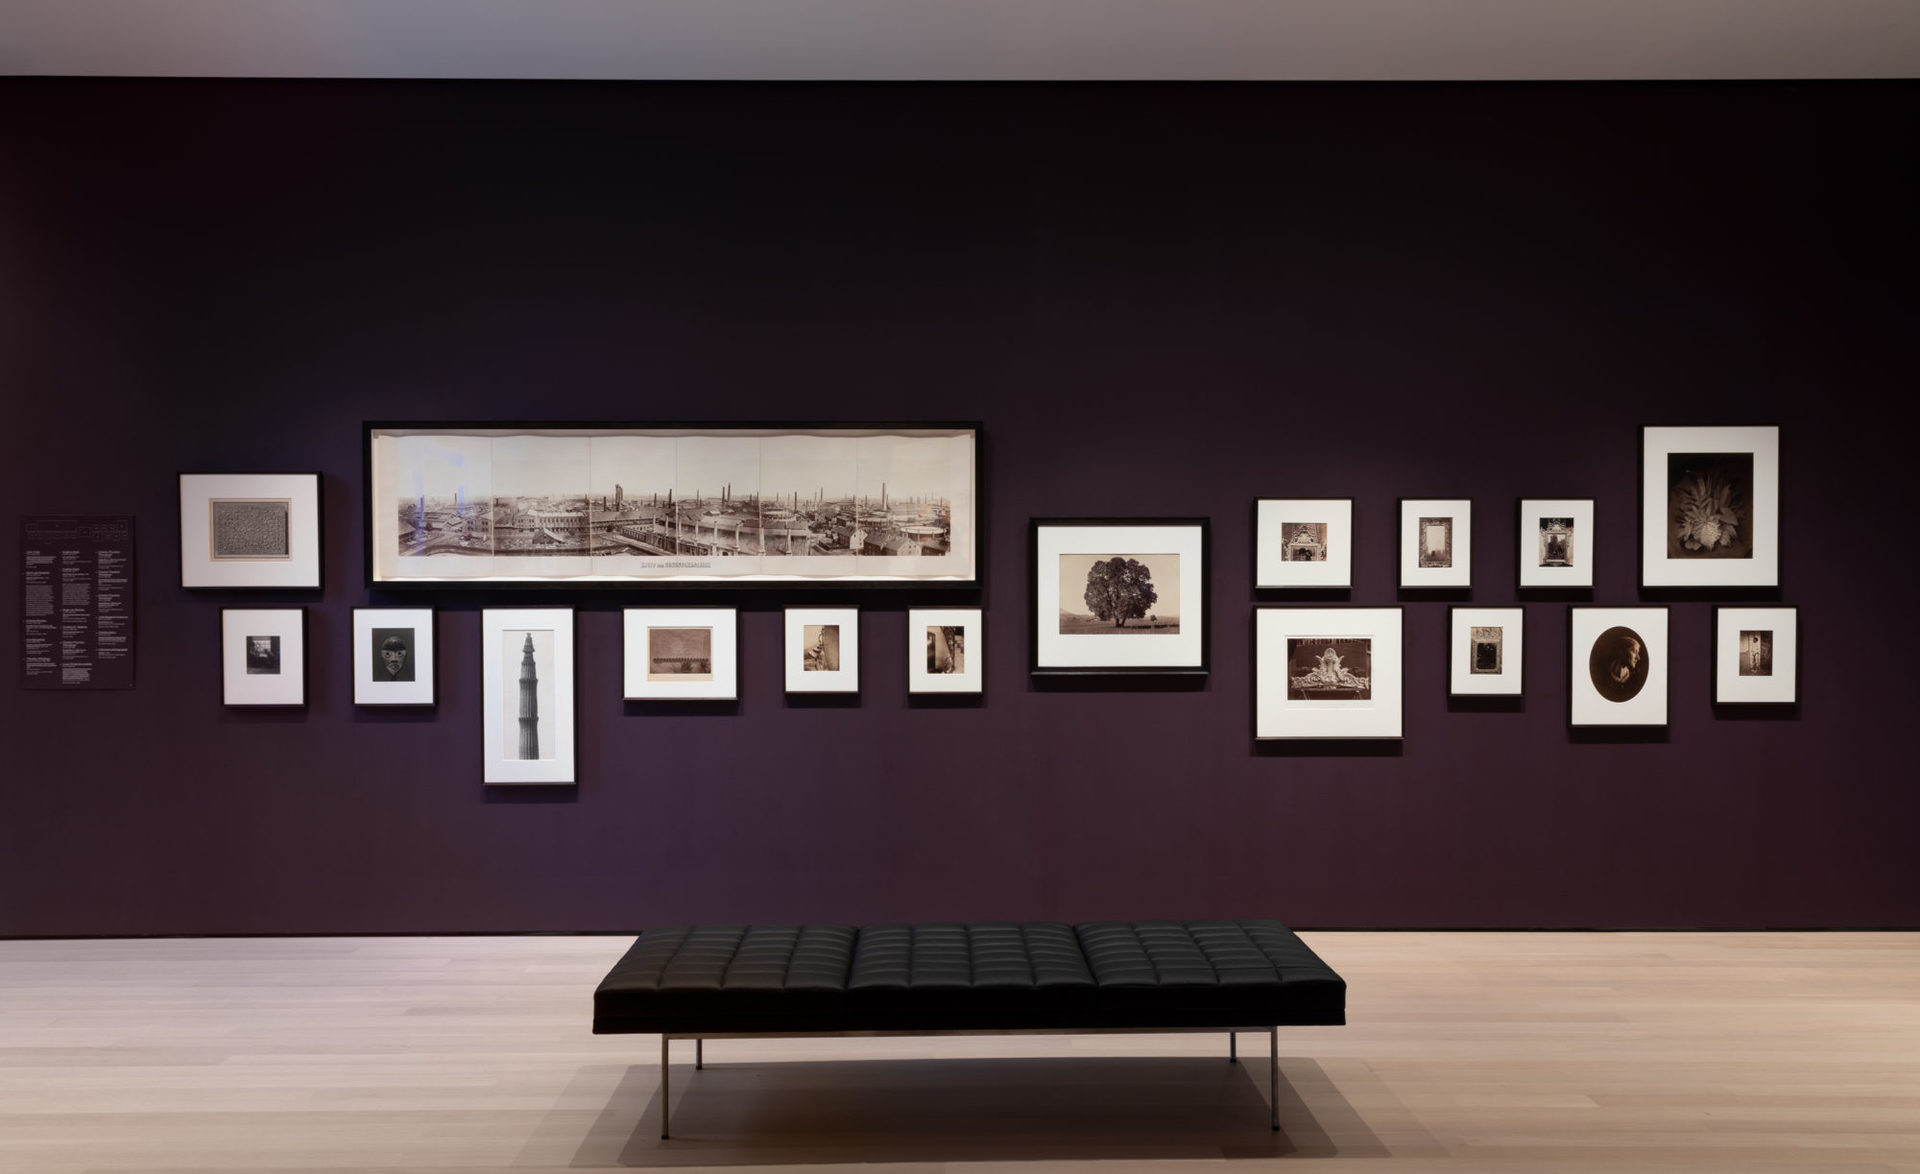 MoMA_gallery502_JonathanMuzikar_alt1-2000x1223.jpg